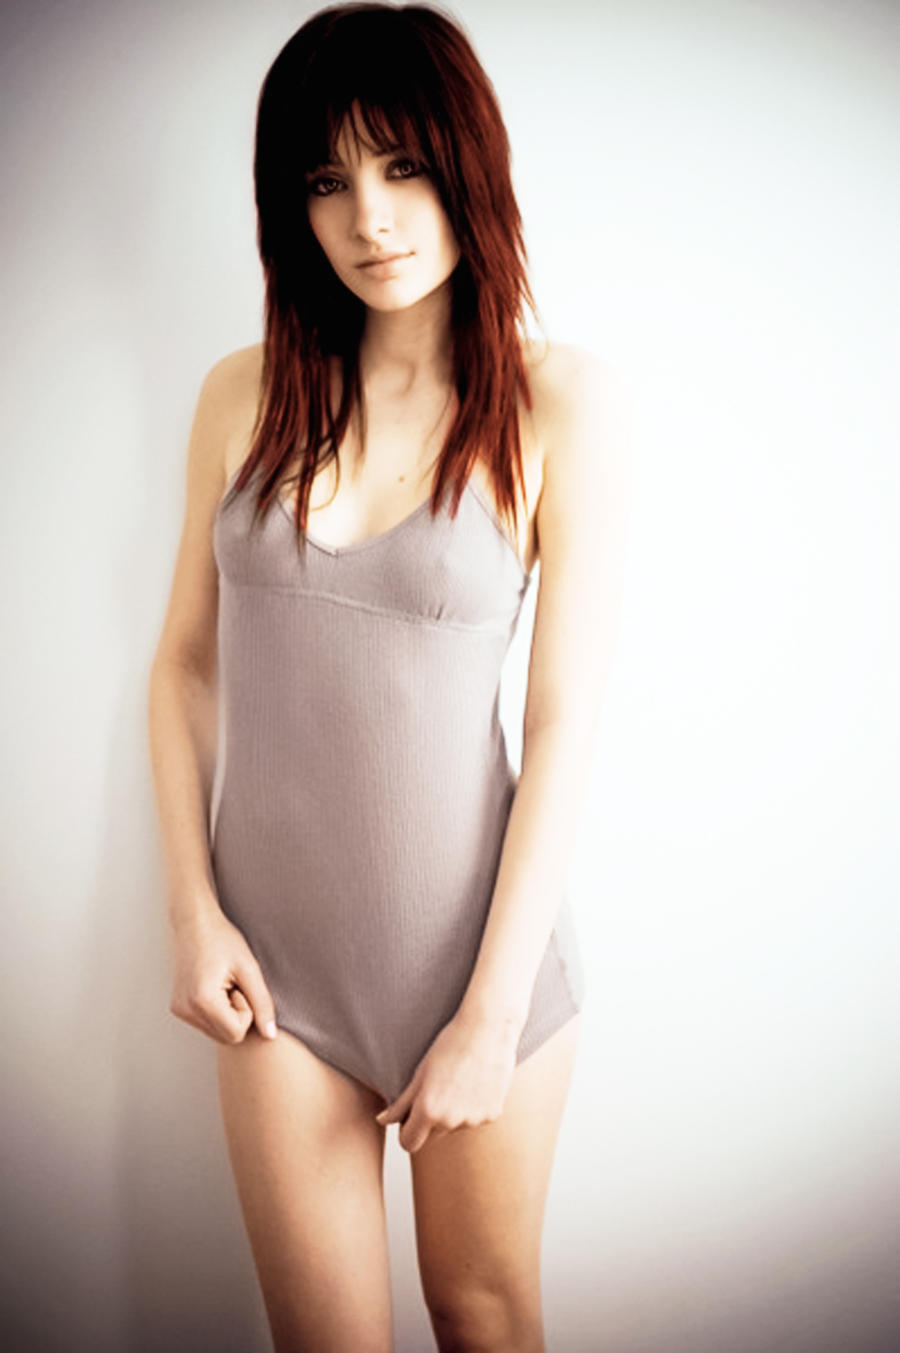 Sexy naked girl wallpaper